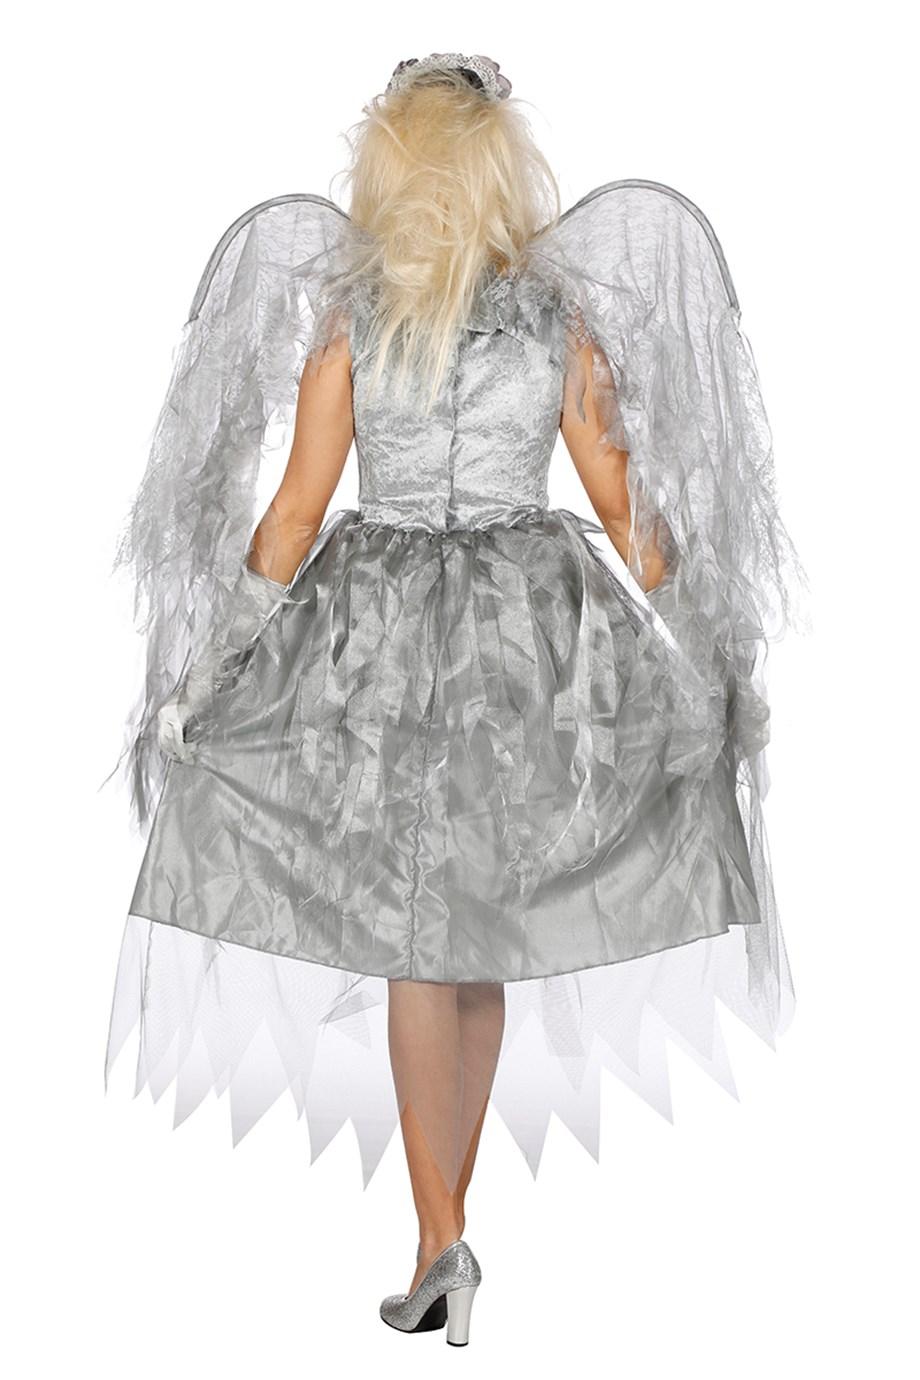 Silver angel-262693